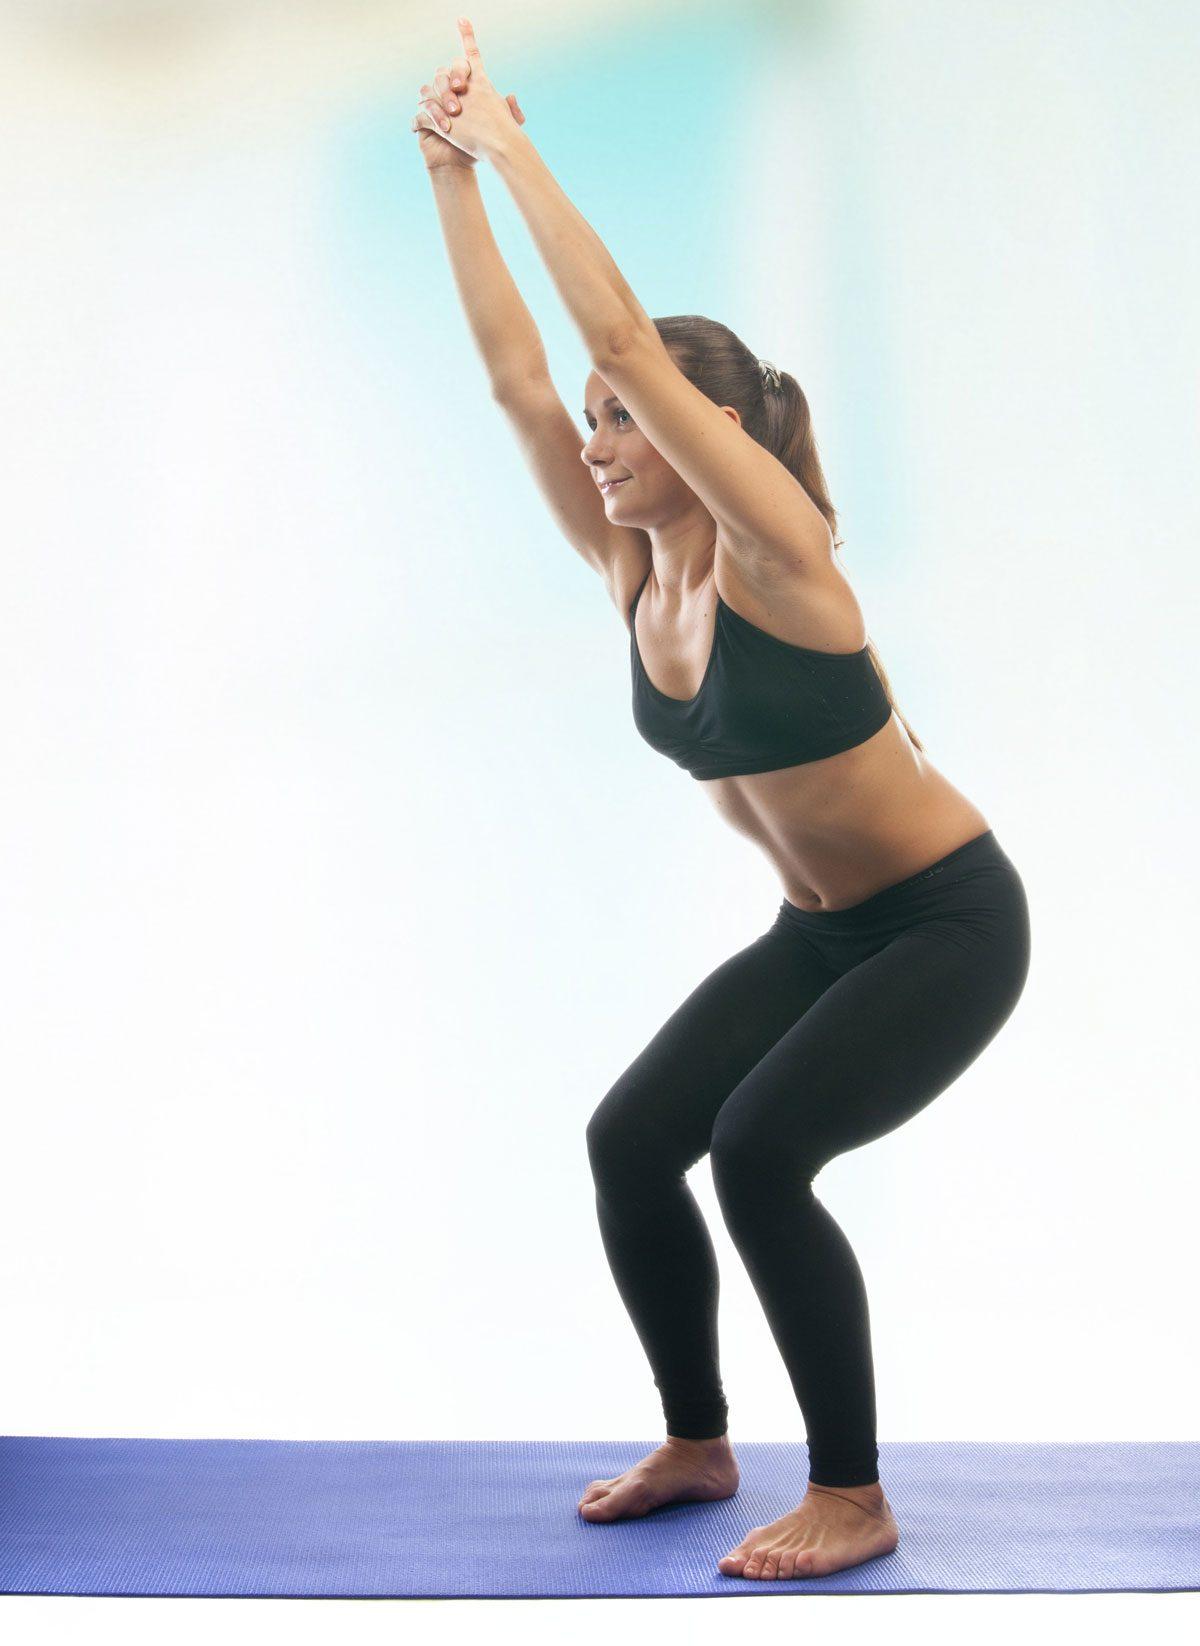 Skip the Kegels: 5 Yoga Poses for Pelvic Health